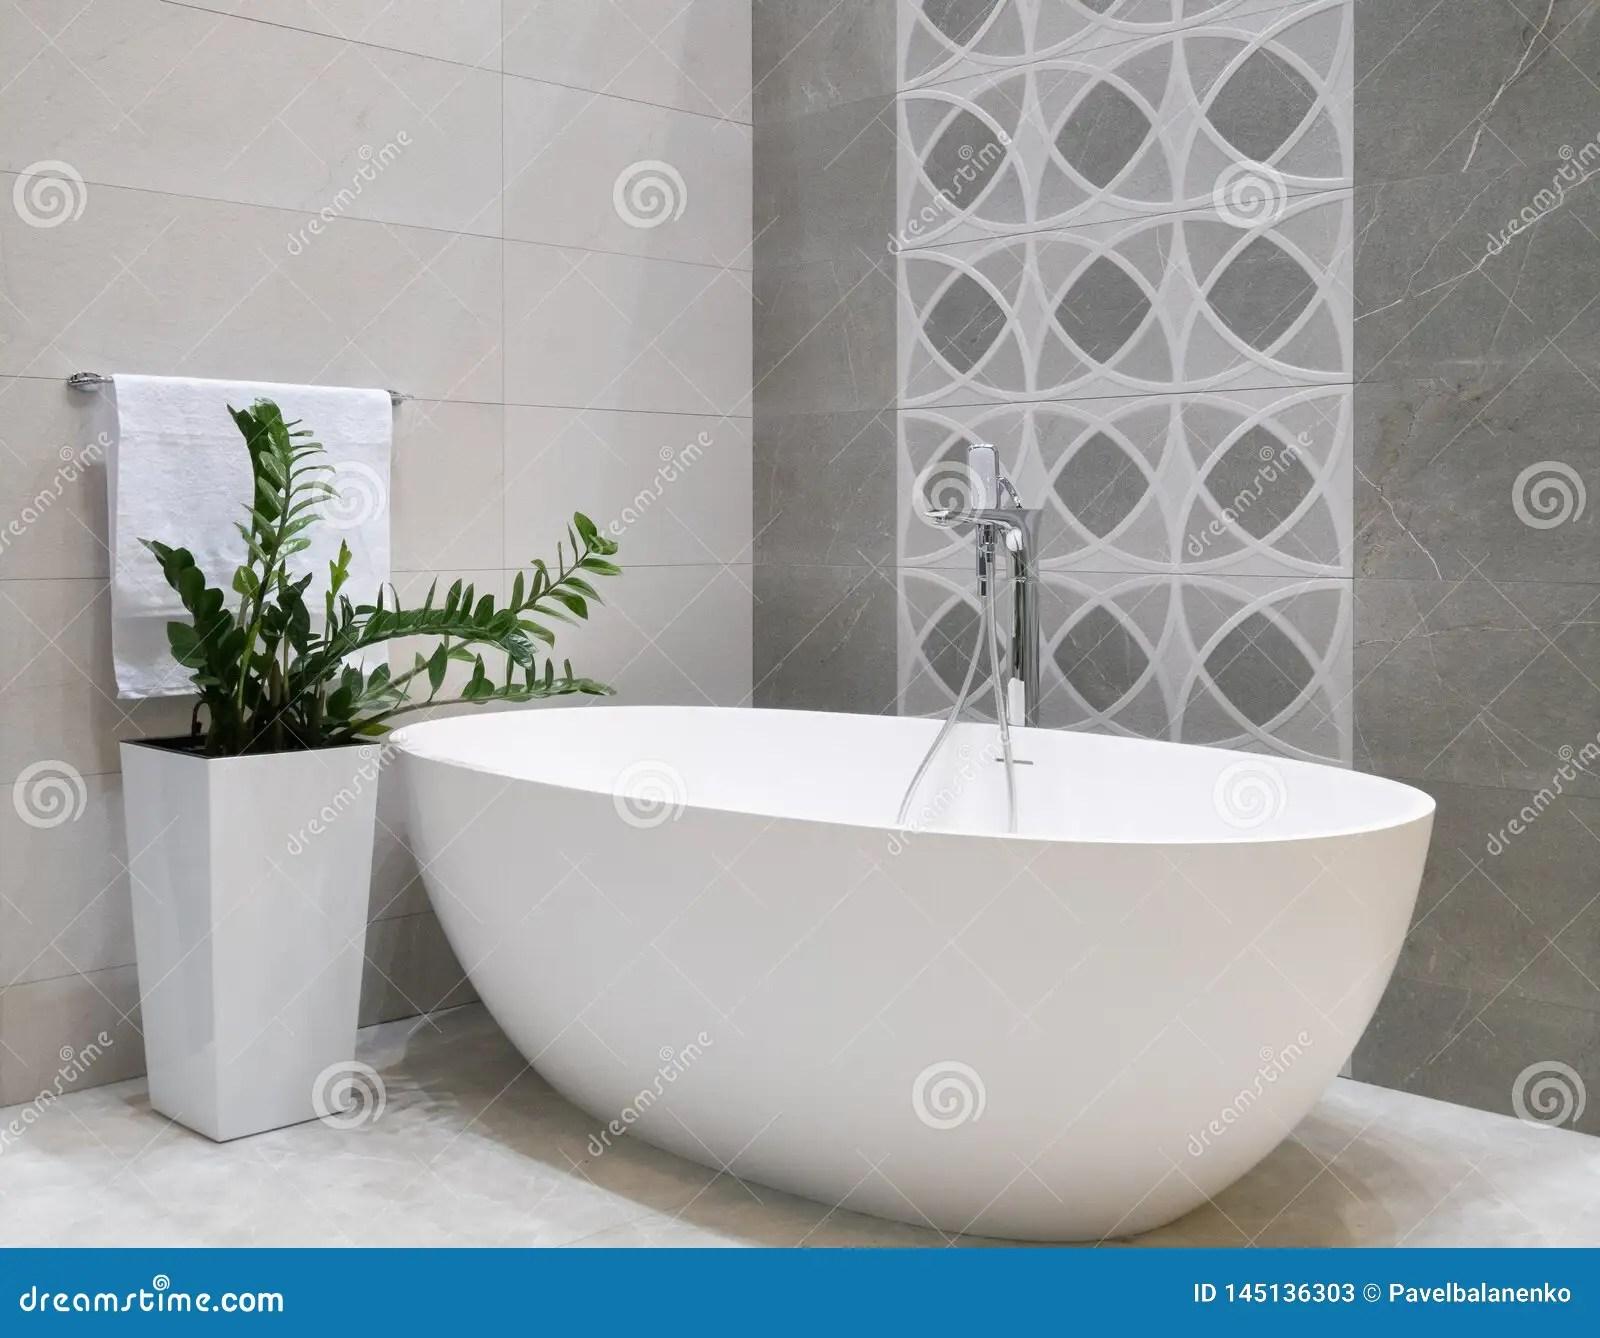 https www dreamstime com modern bathroom interior design white stone bathtub grey tiles wall ceramic flowerpot green plant hanger modern image145136303